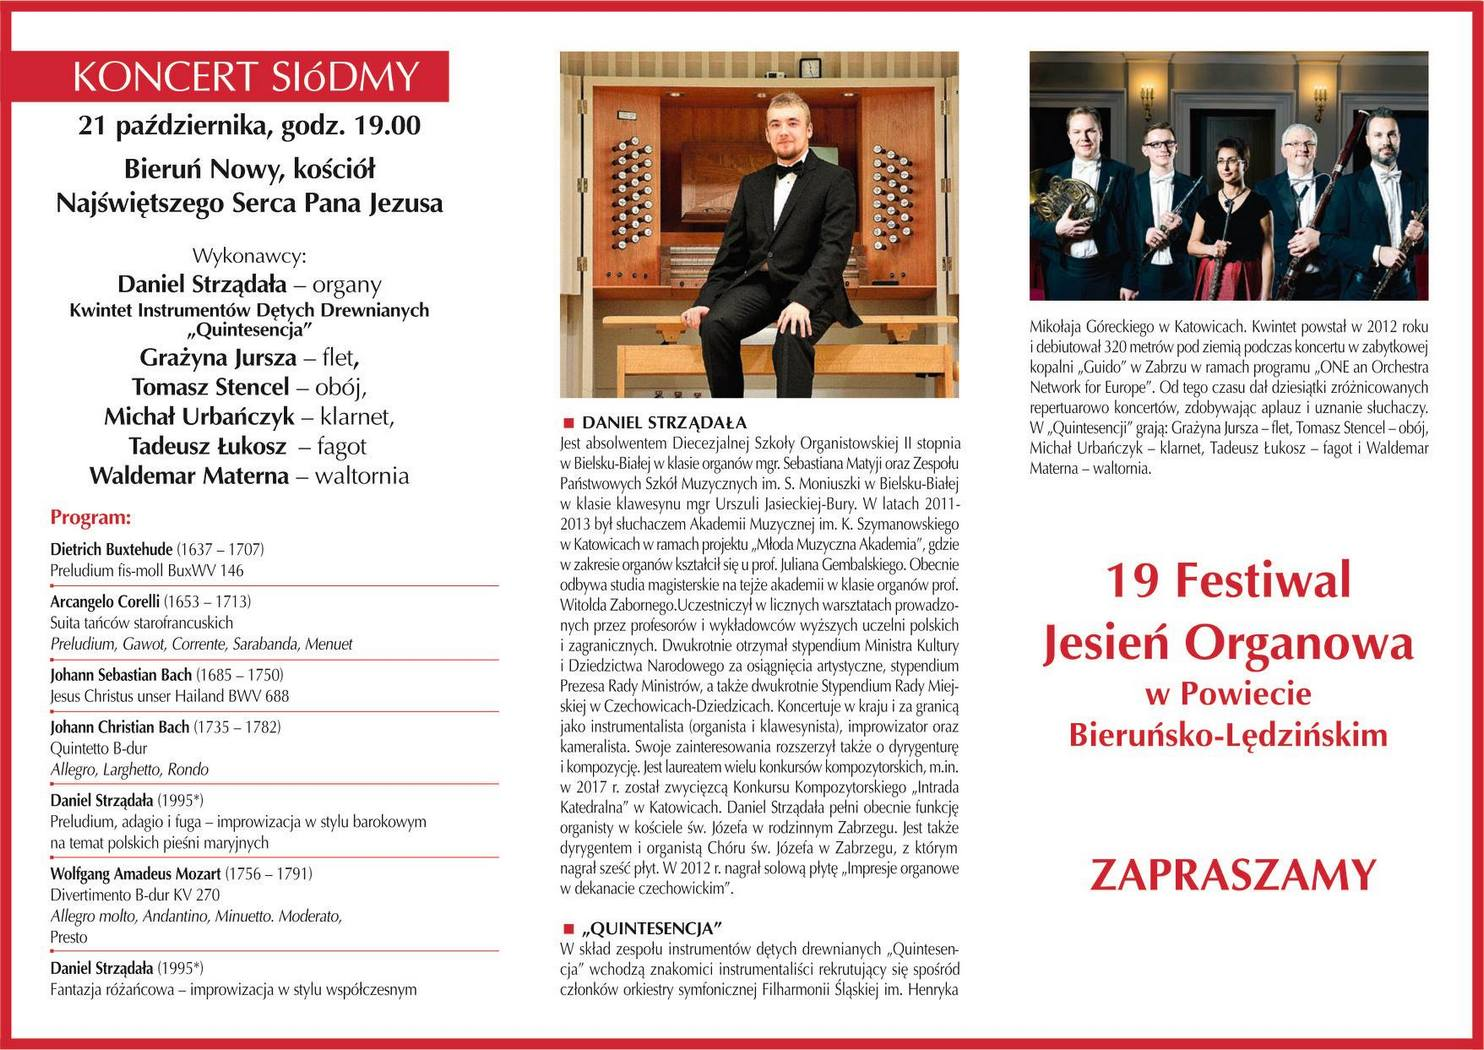 19 Festiwal Jesień Organowa: Koncert siódmy